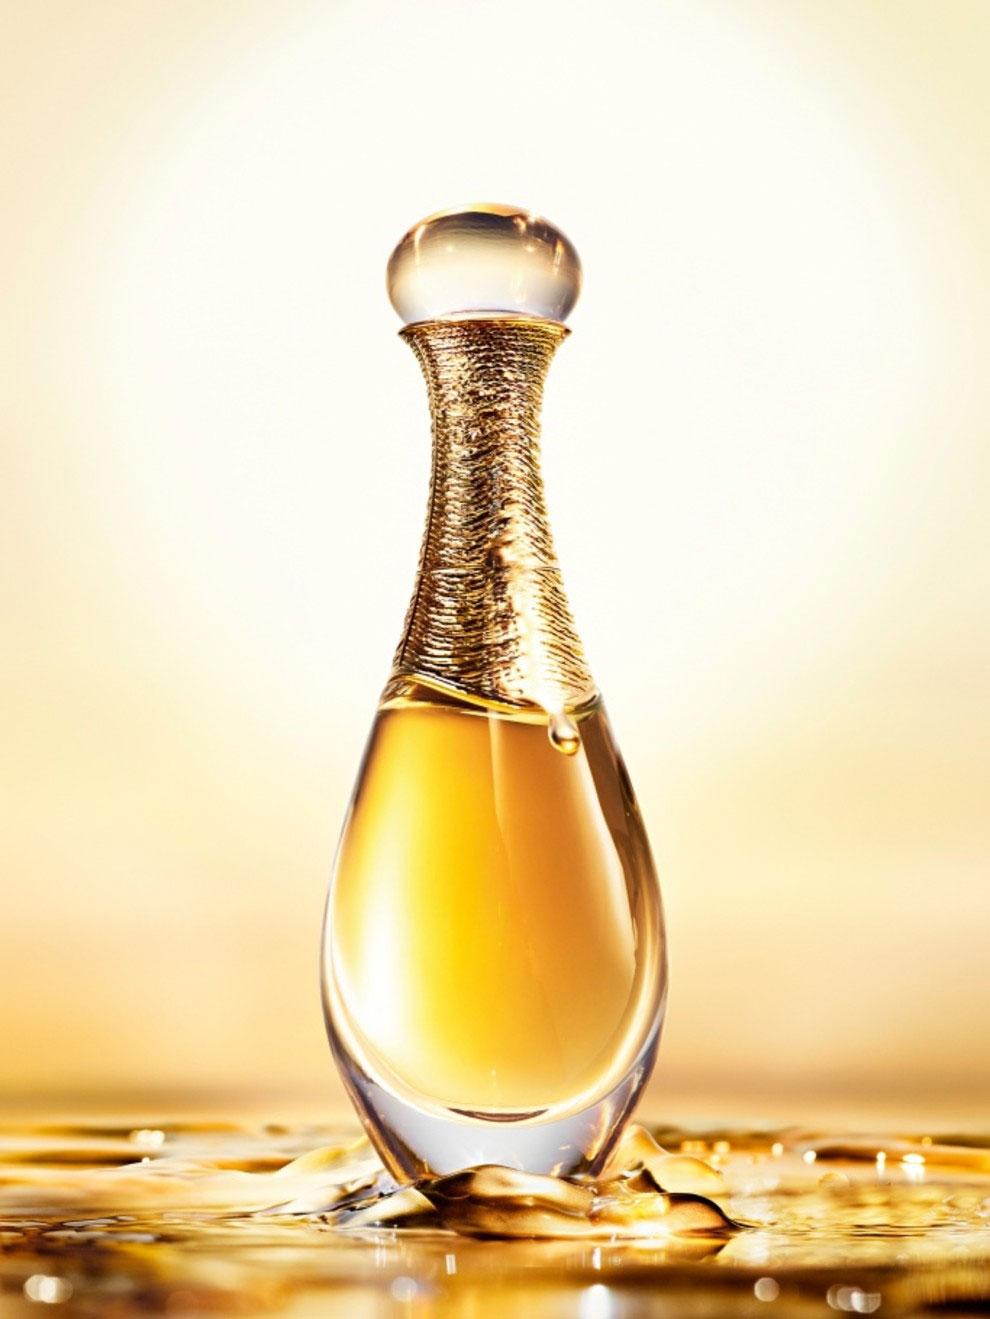 j 39 adore l 39 or 2017 christian dior perfume a new. Black Bedroom Furniture Sets. Home Design Ideas